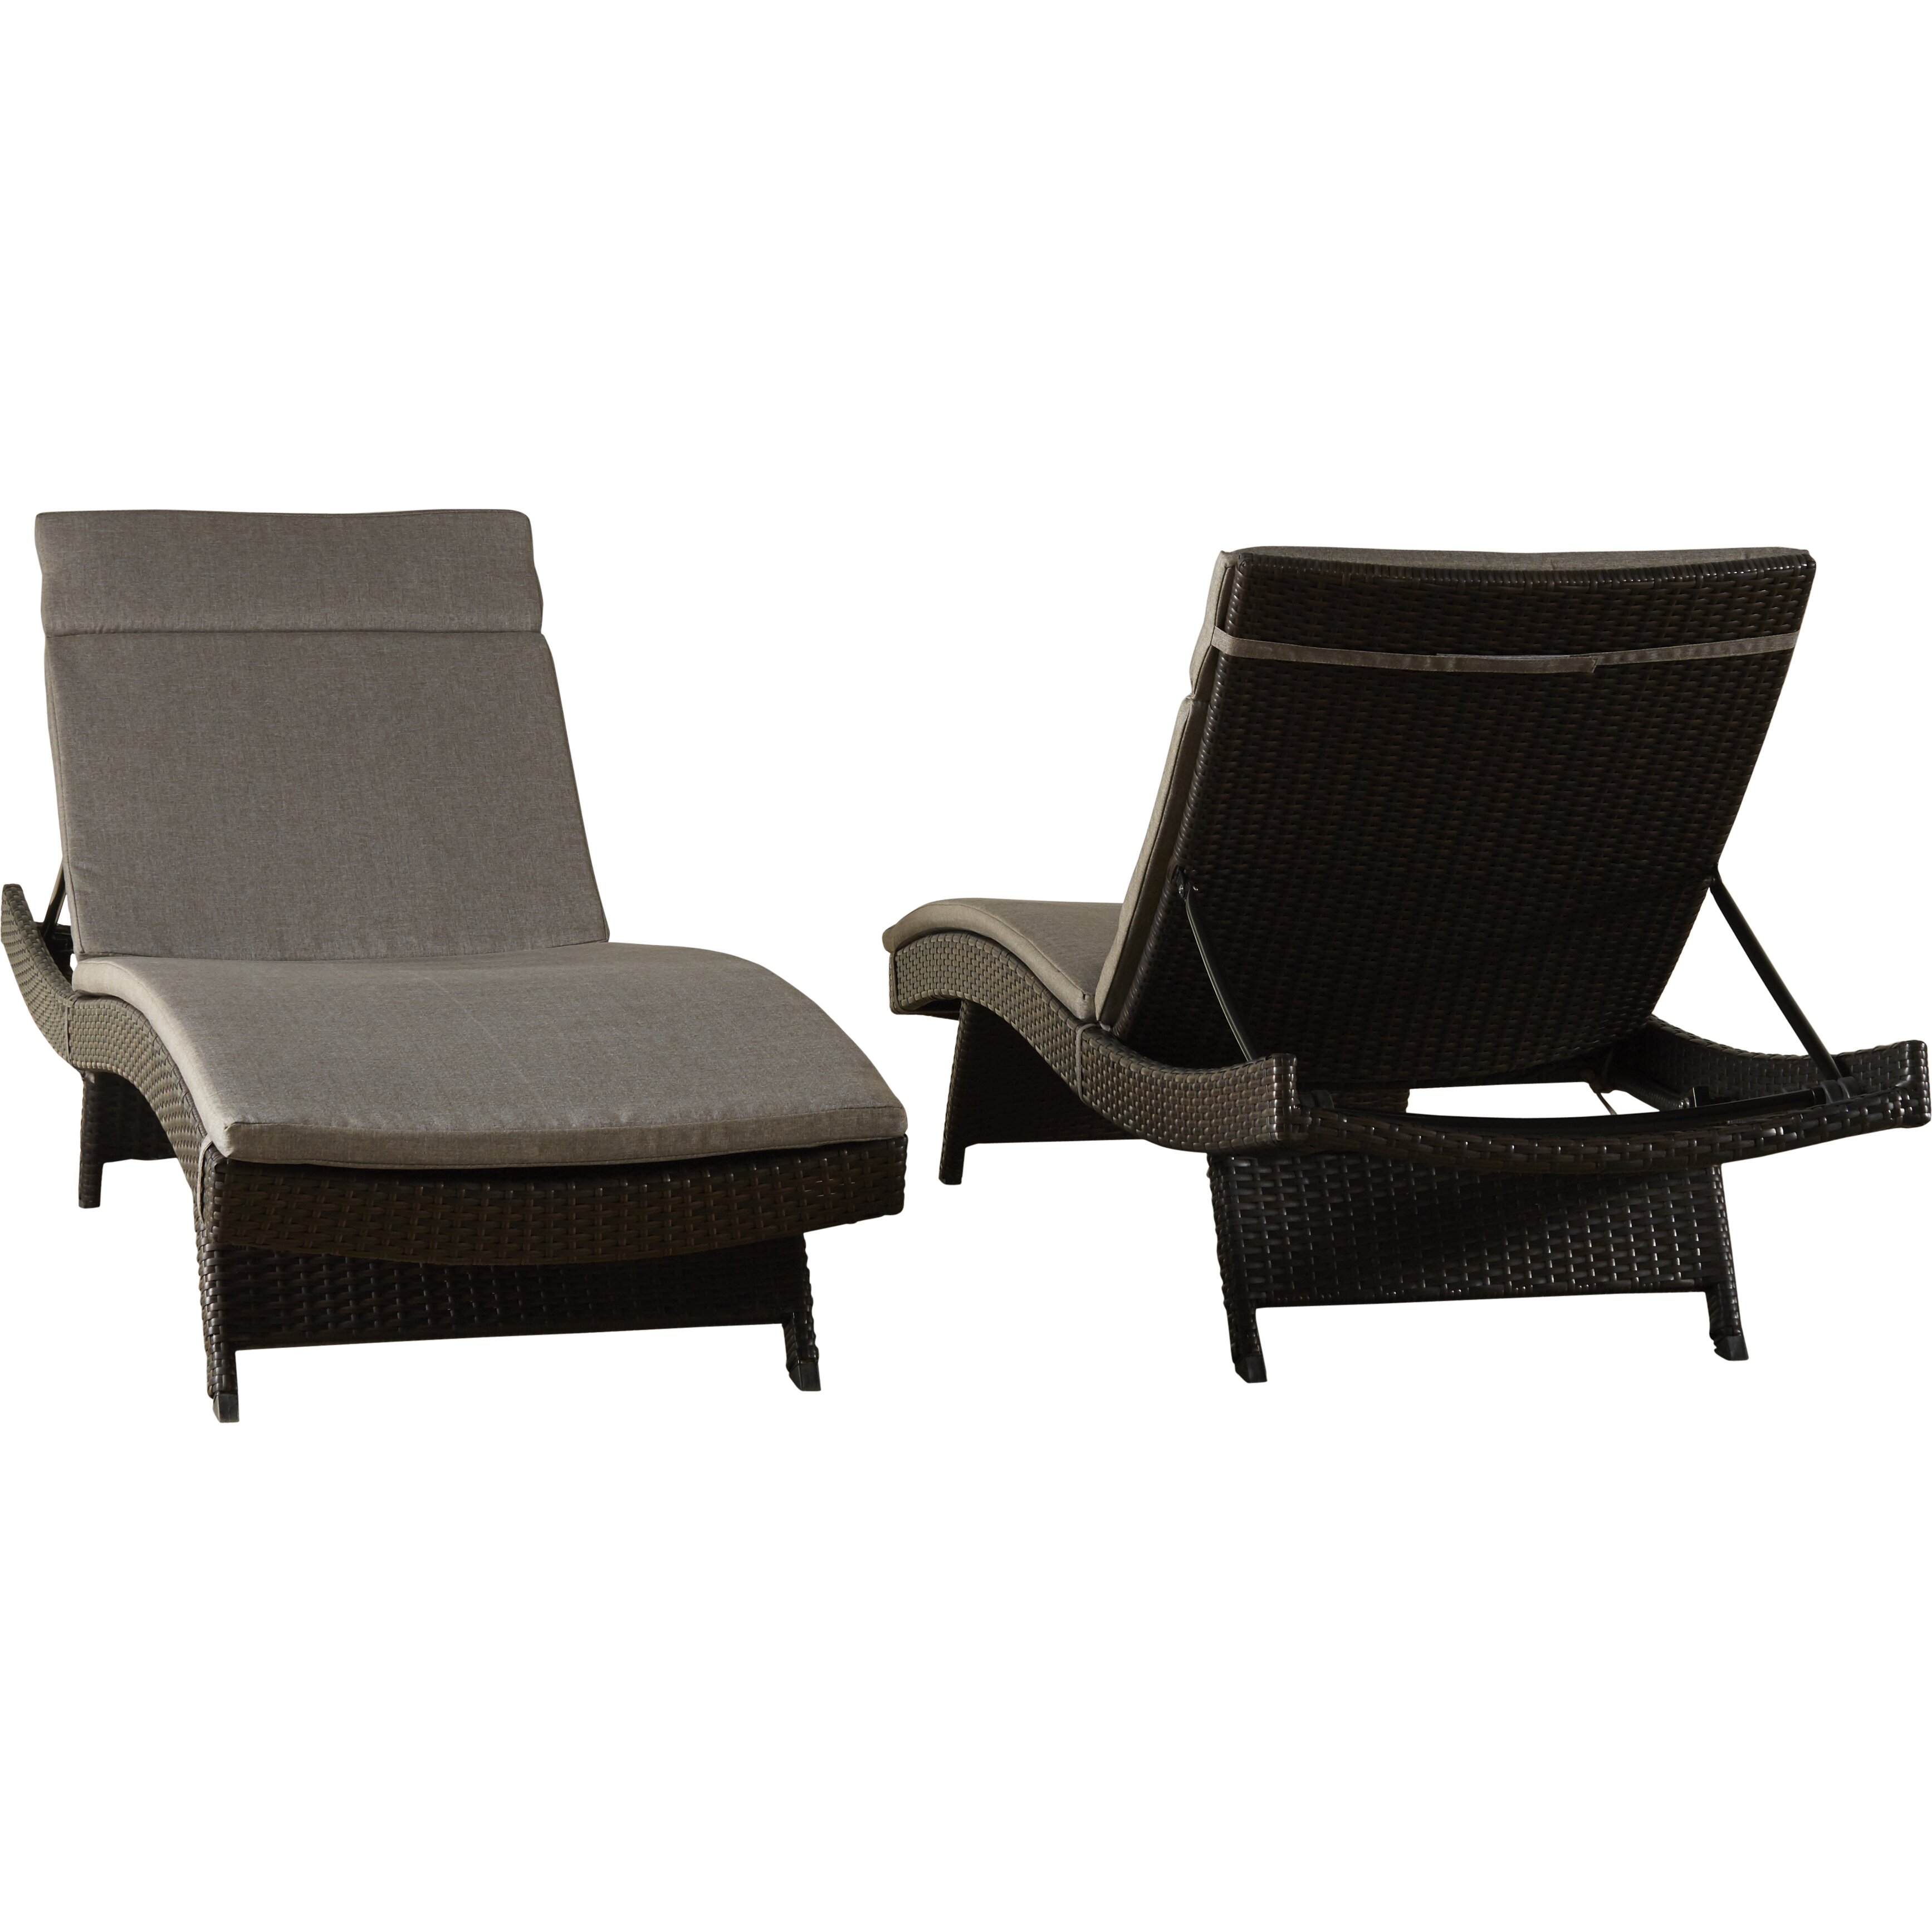 Brayden studio ferrara chaise lounge with cushion for Buy chaise lounge cushion